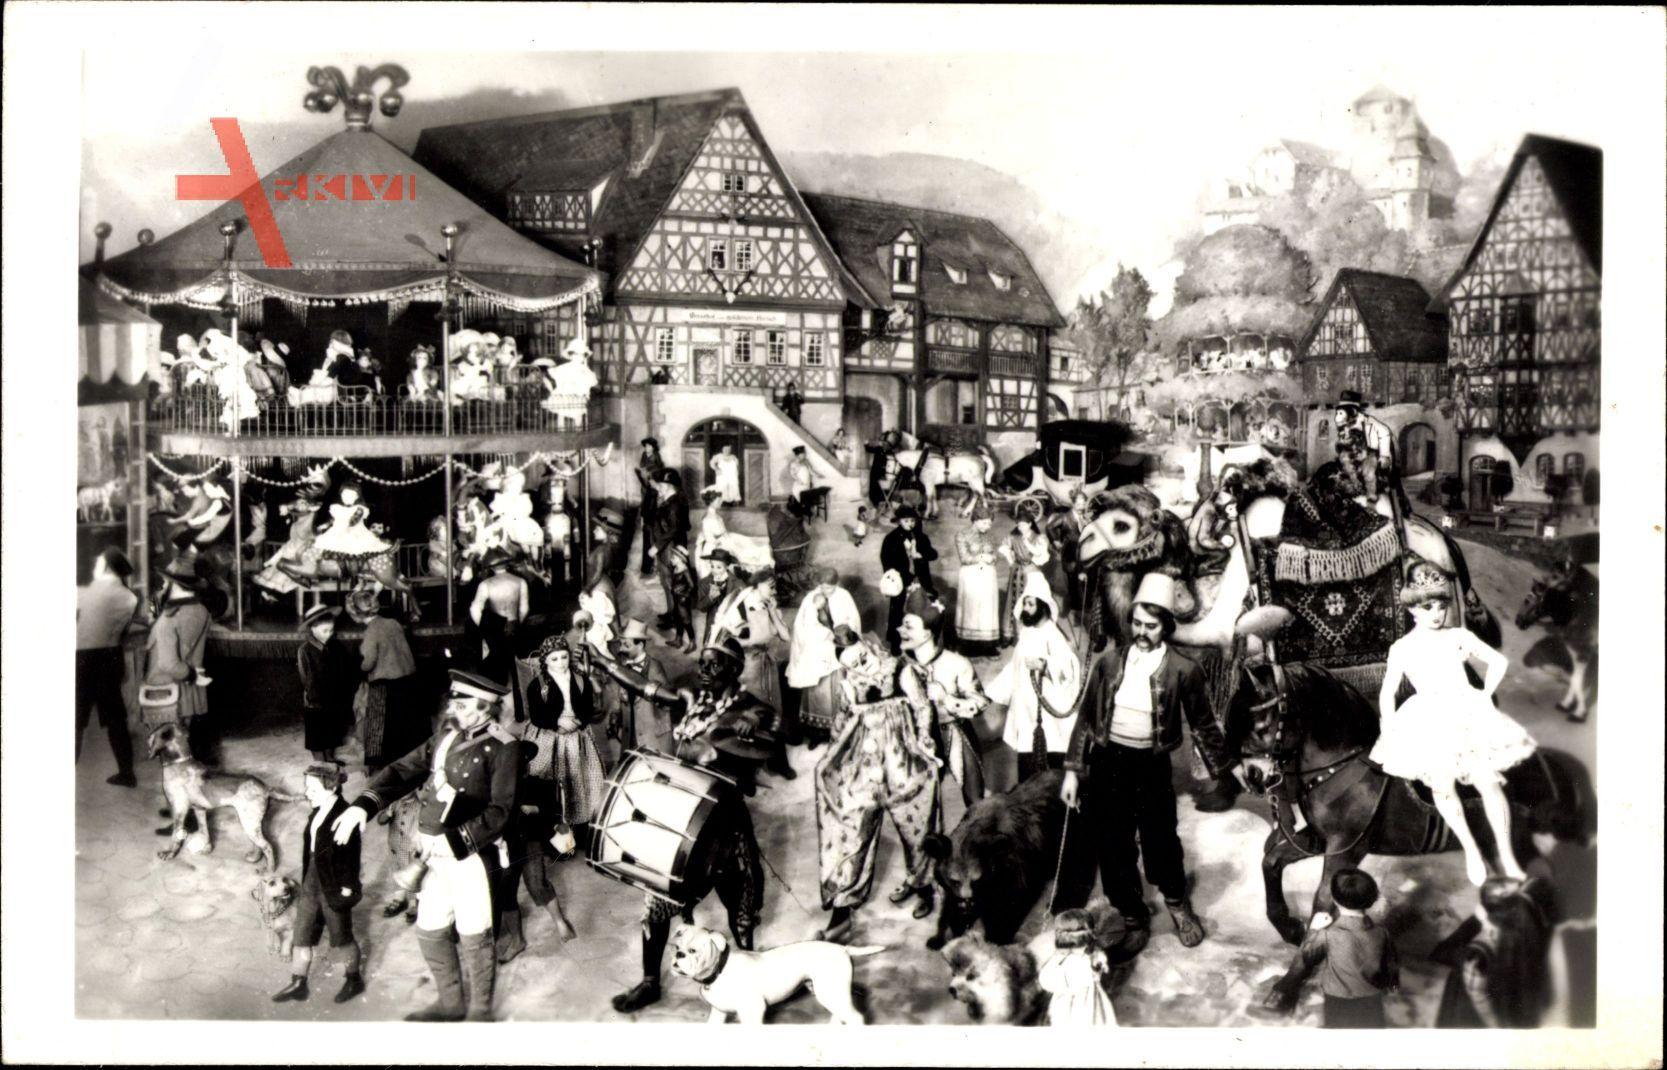 Sonneberg in Thüringen, Kirmes, Waltausstellungsgruppe 1910, Spielzeug